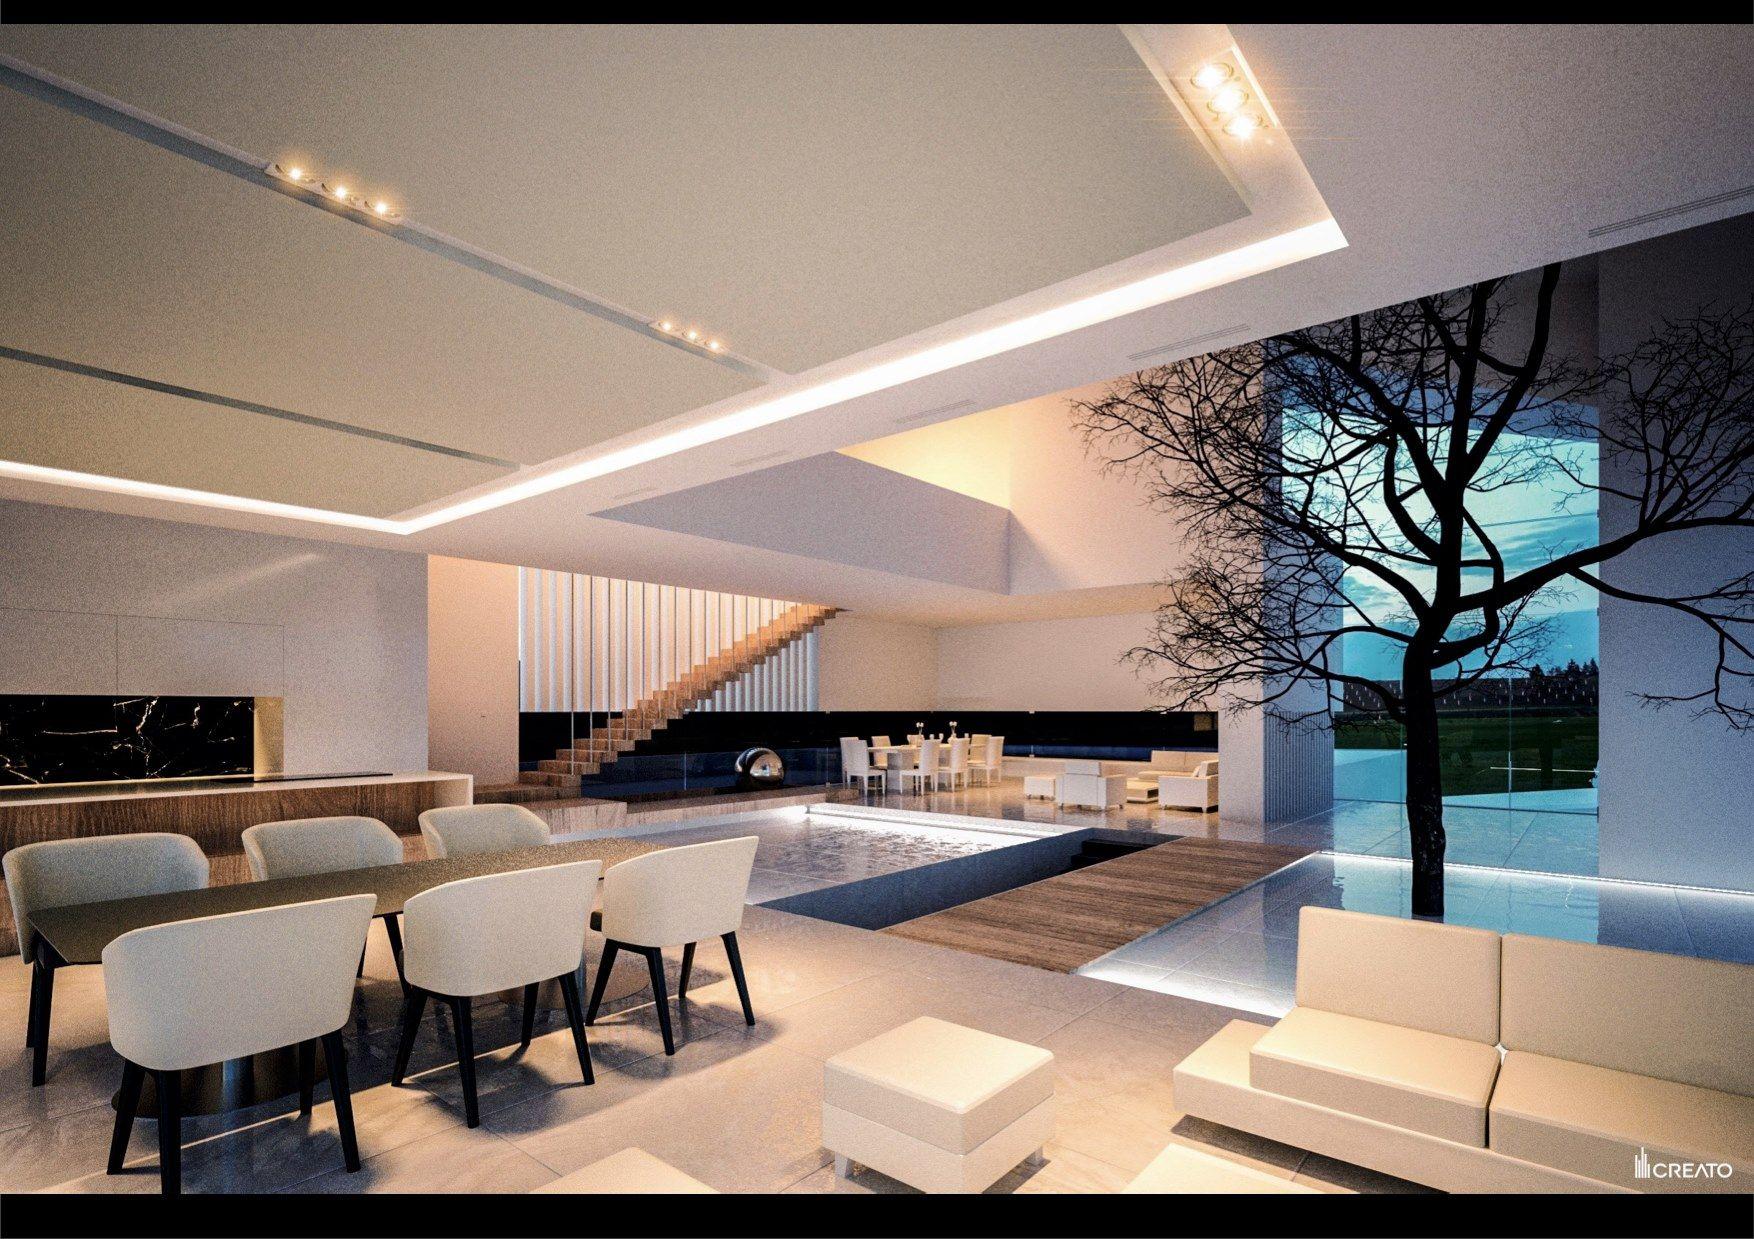 Darwish Villa Amman Jordan Conceptual Approved Creato Luxe